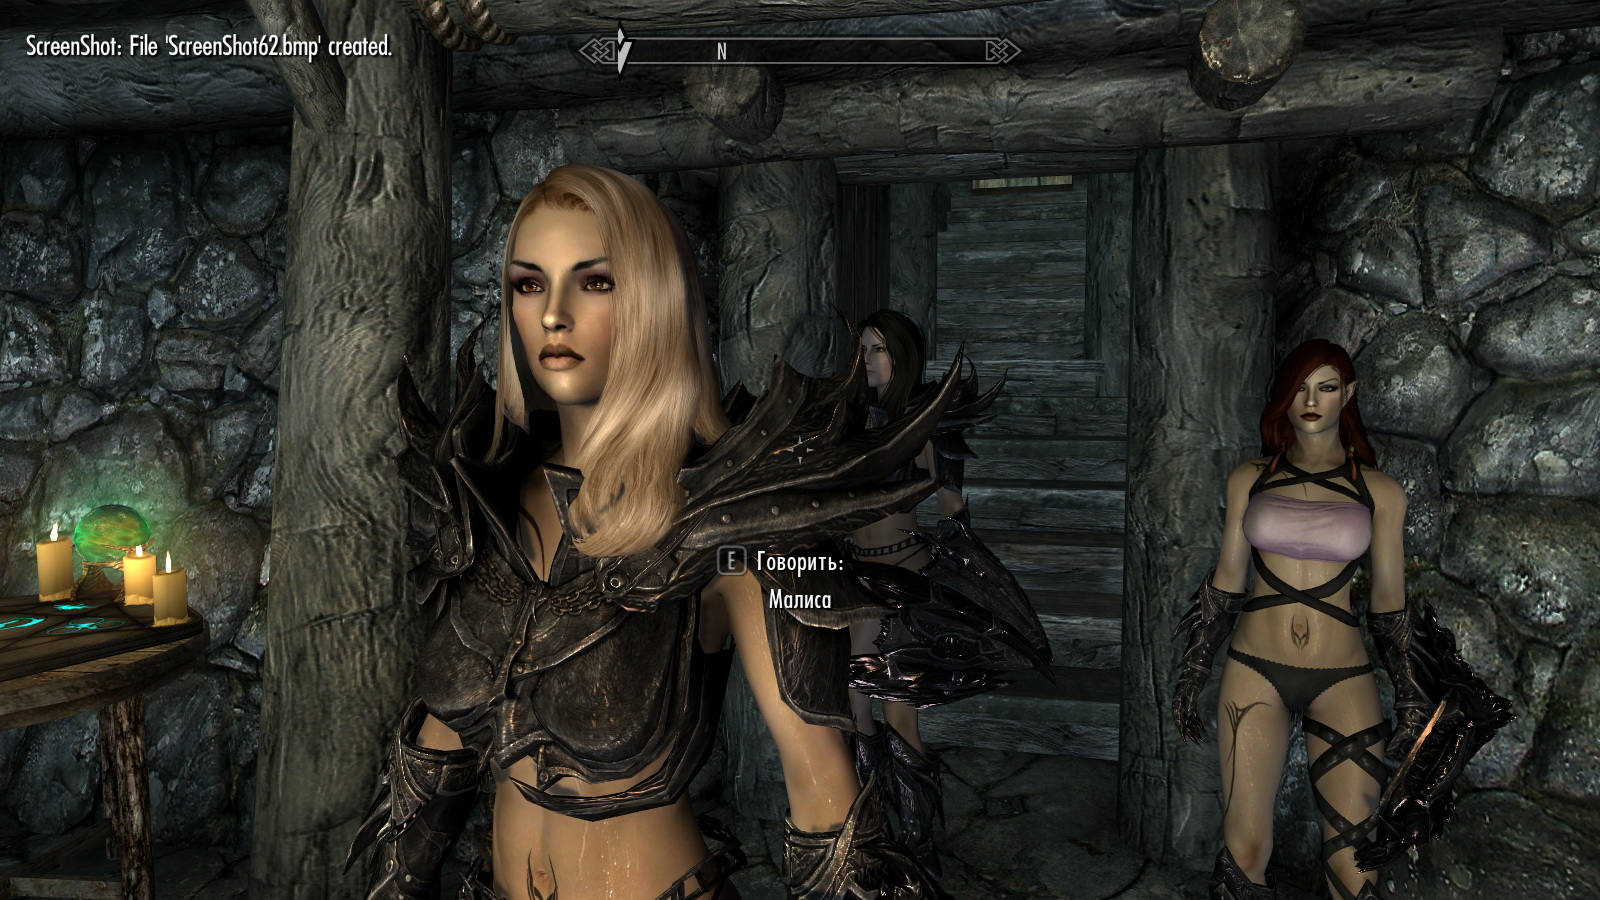 ScreenShot63.jpg - Elder Scrolls 5: Skyrim, the